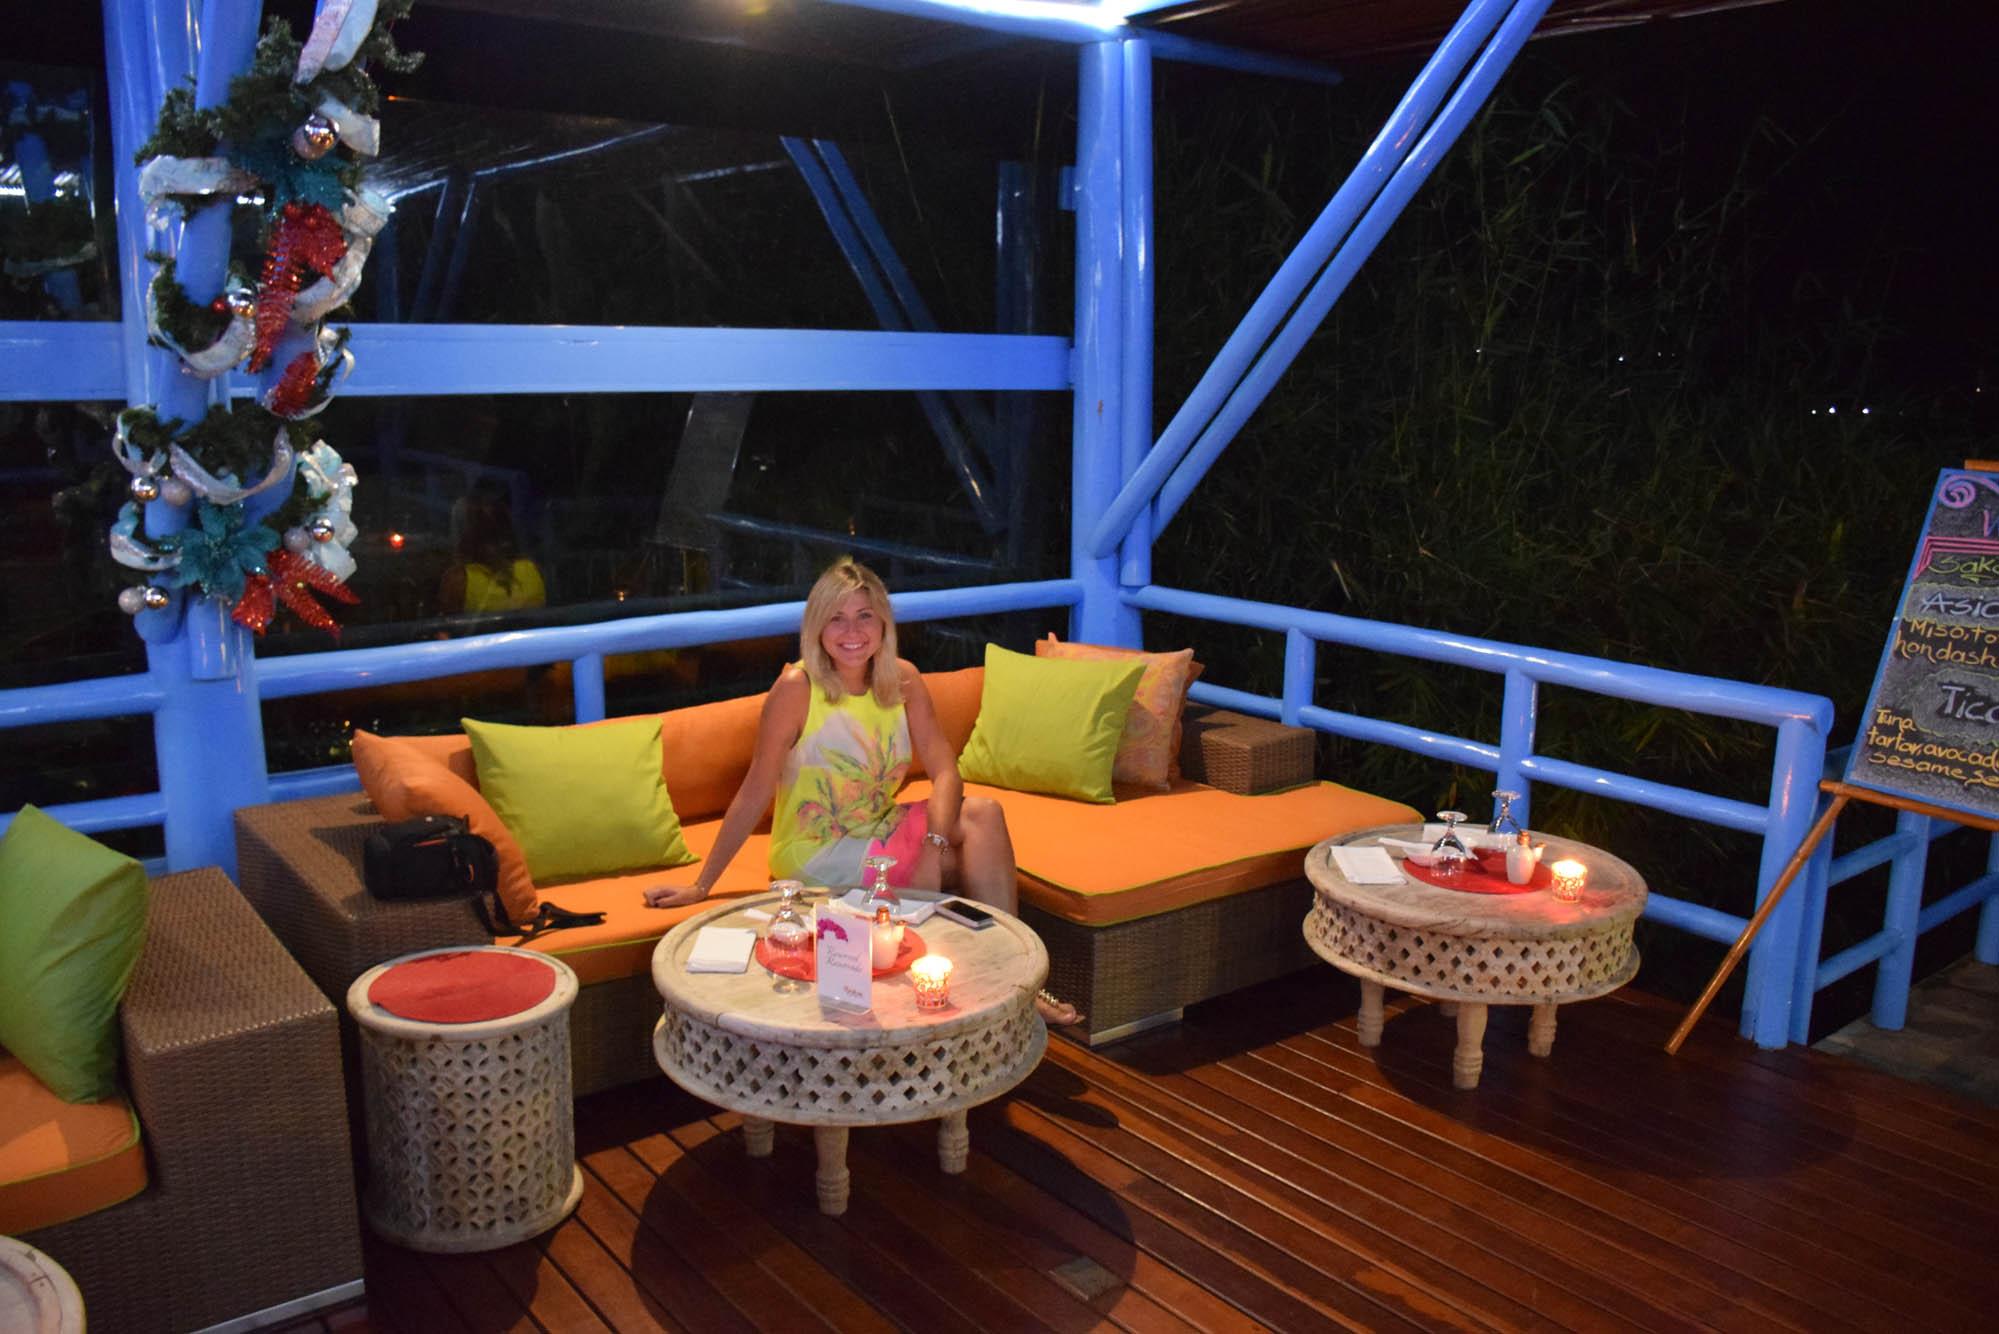 Restaurante Asia Luna - Nayara Hotel Spa & Gardens - La Fortuna/Arenal - Costa Rica